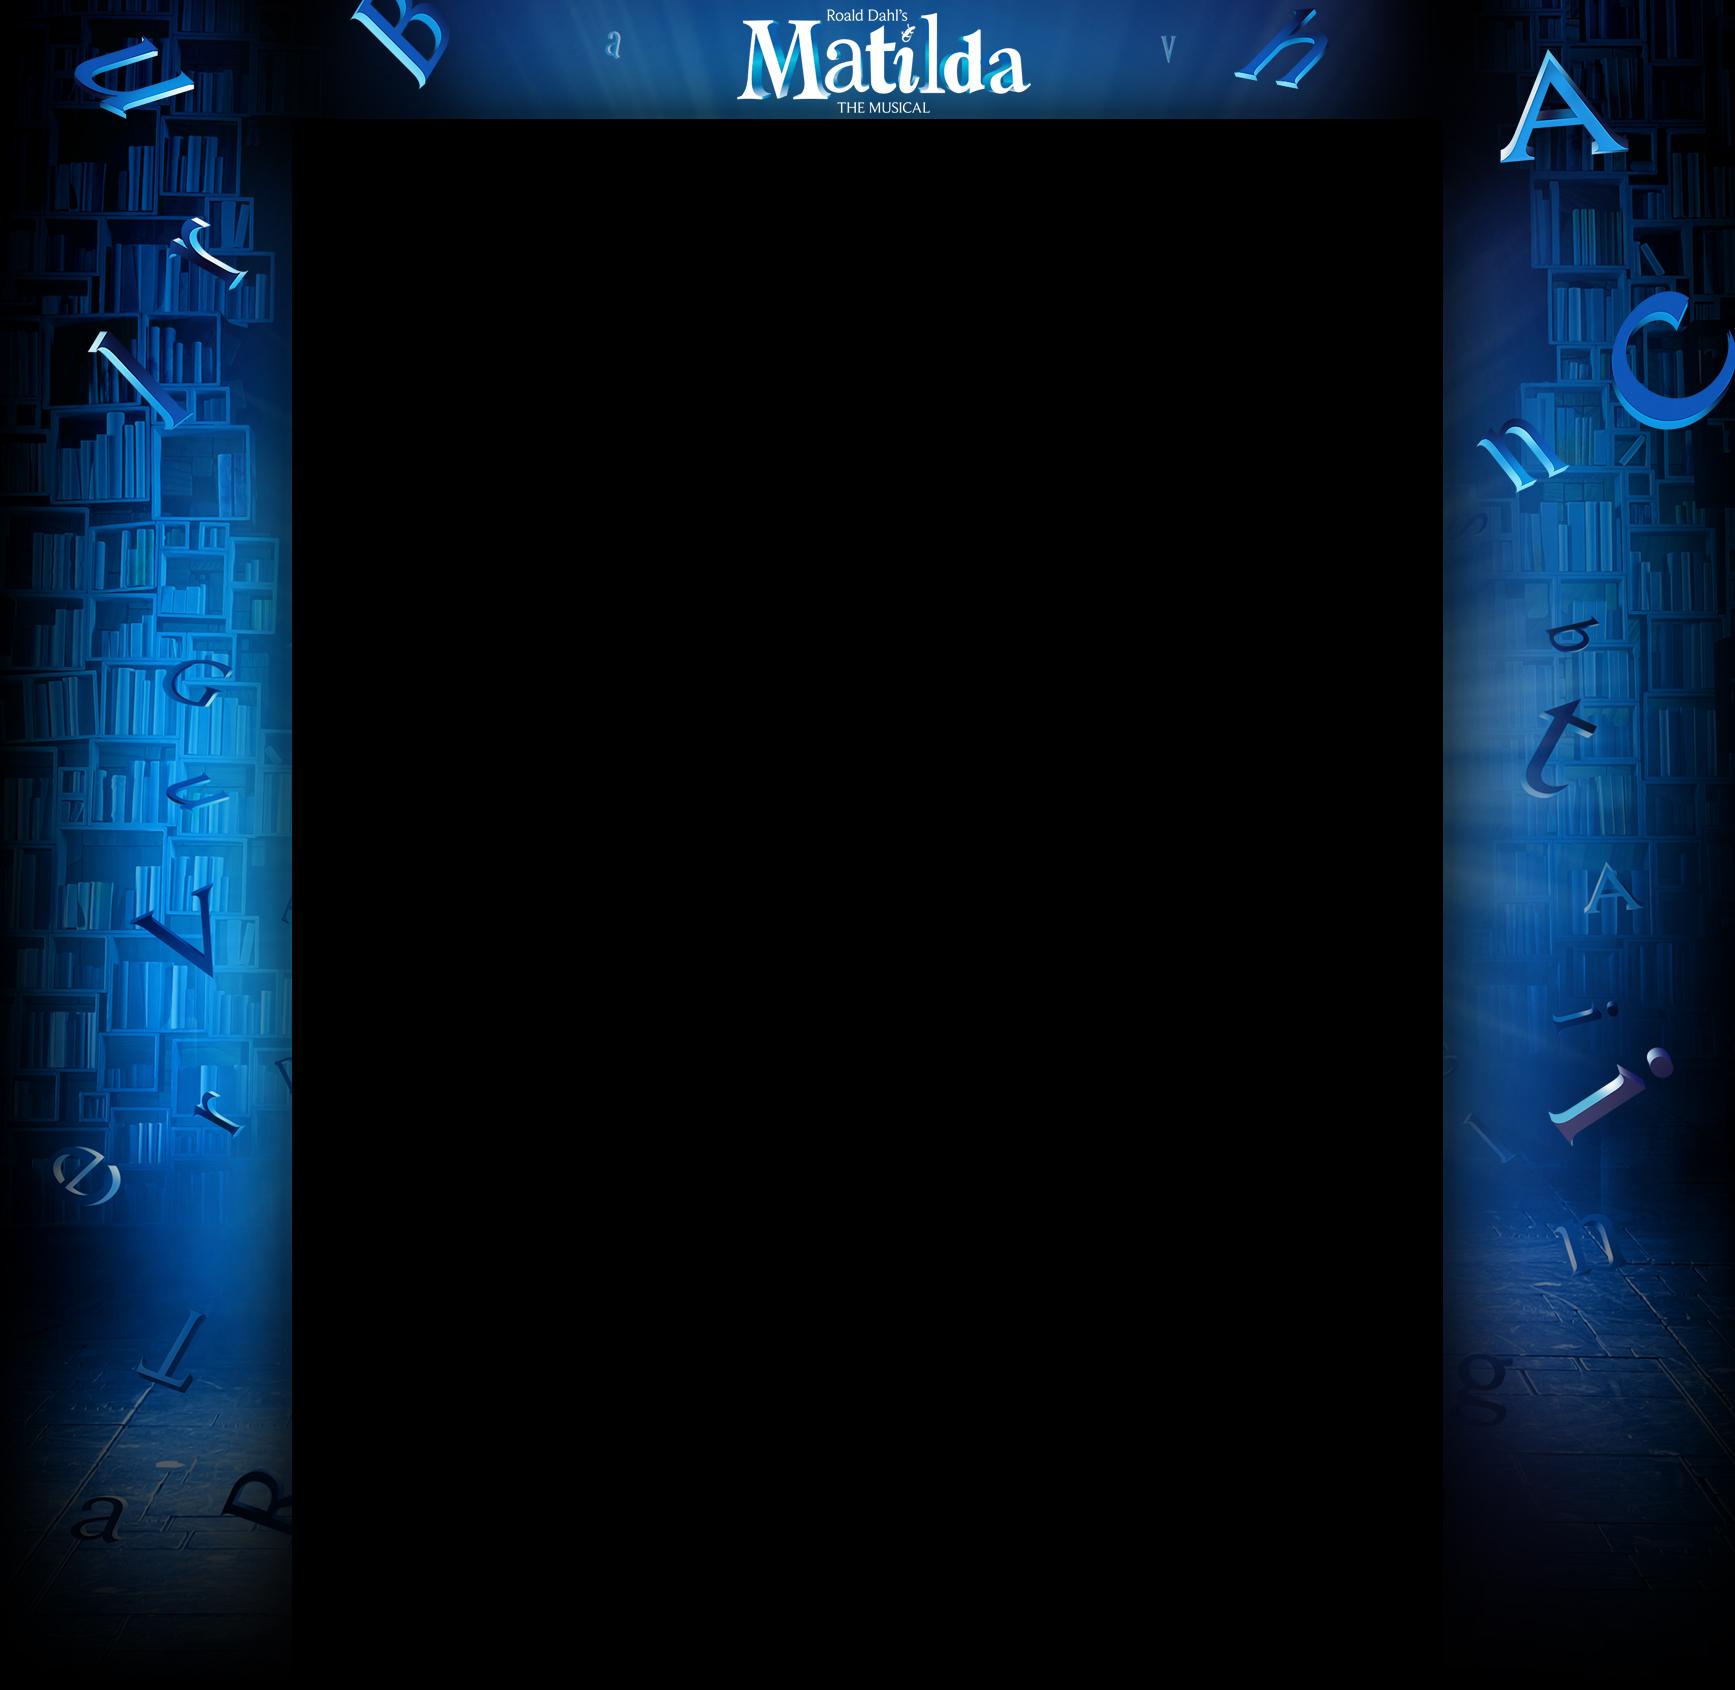 matilda-background-si.jpg